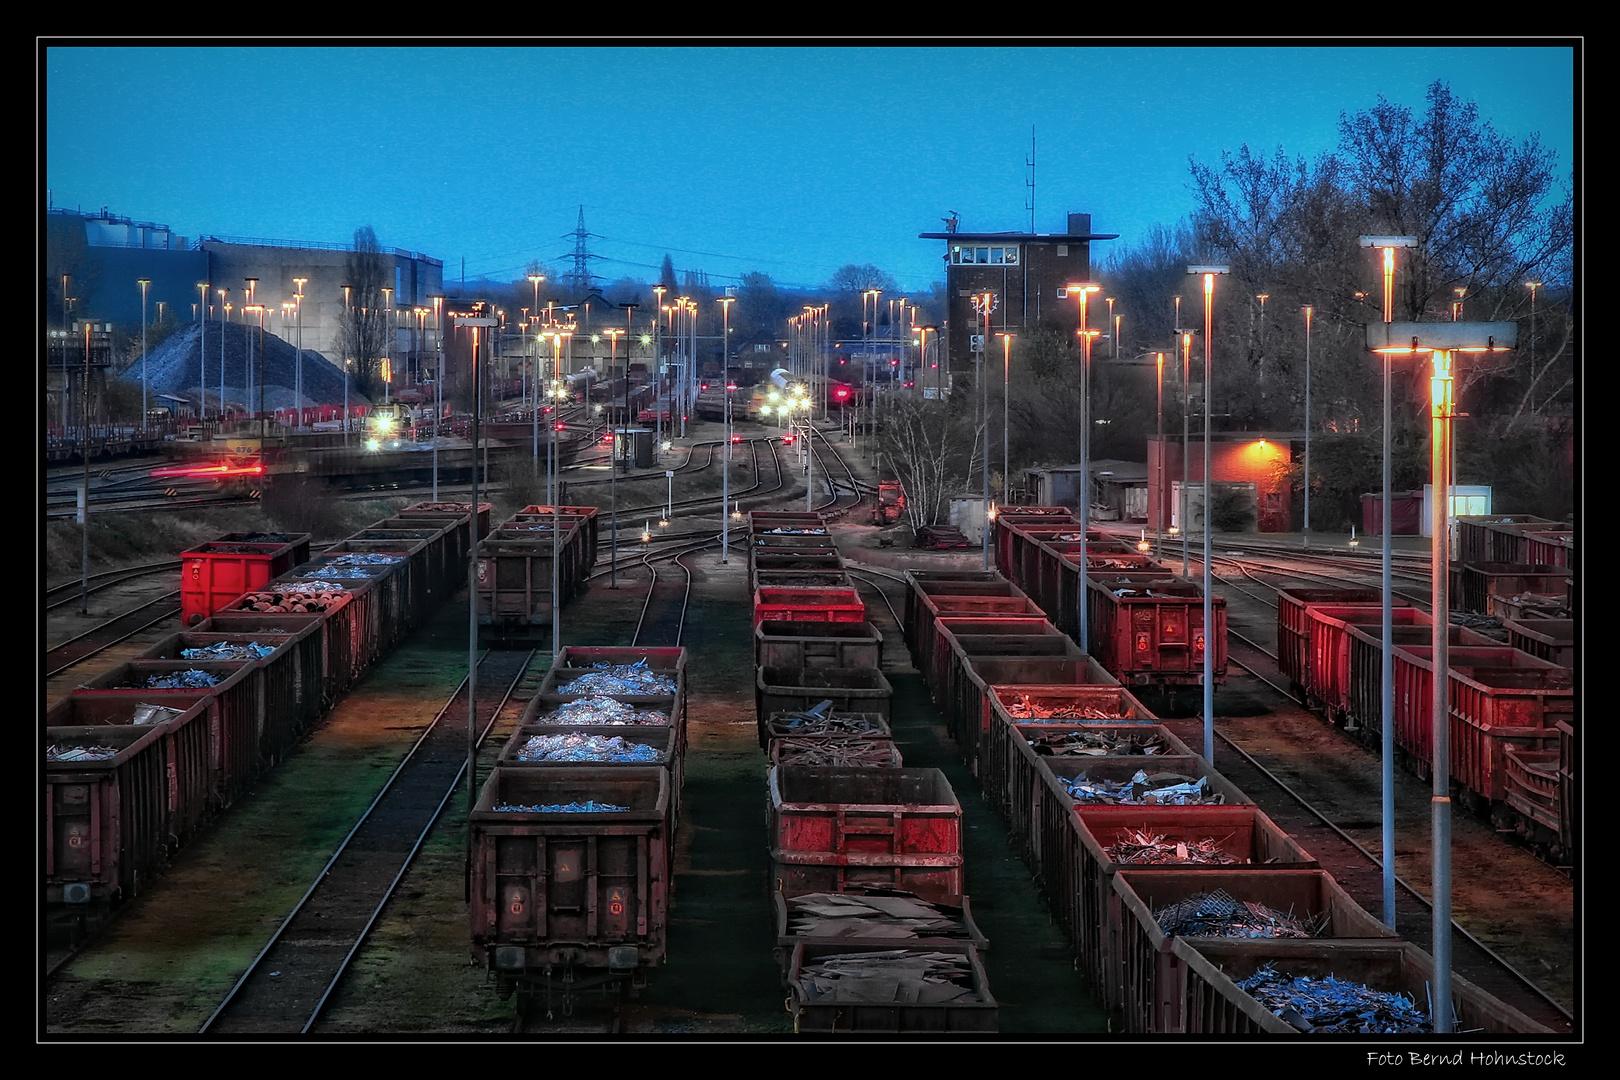 HKM Güterbahnhof ....